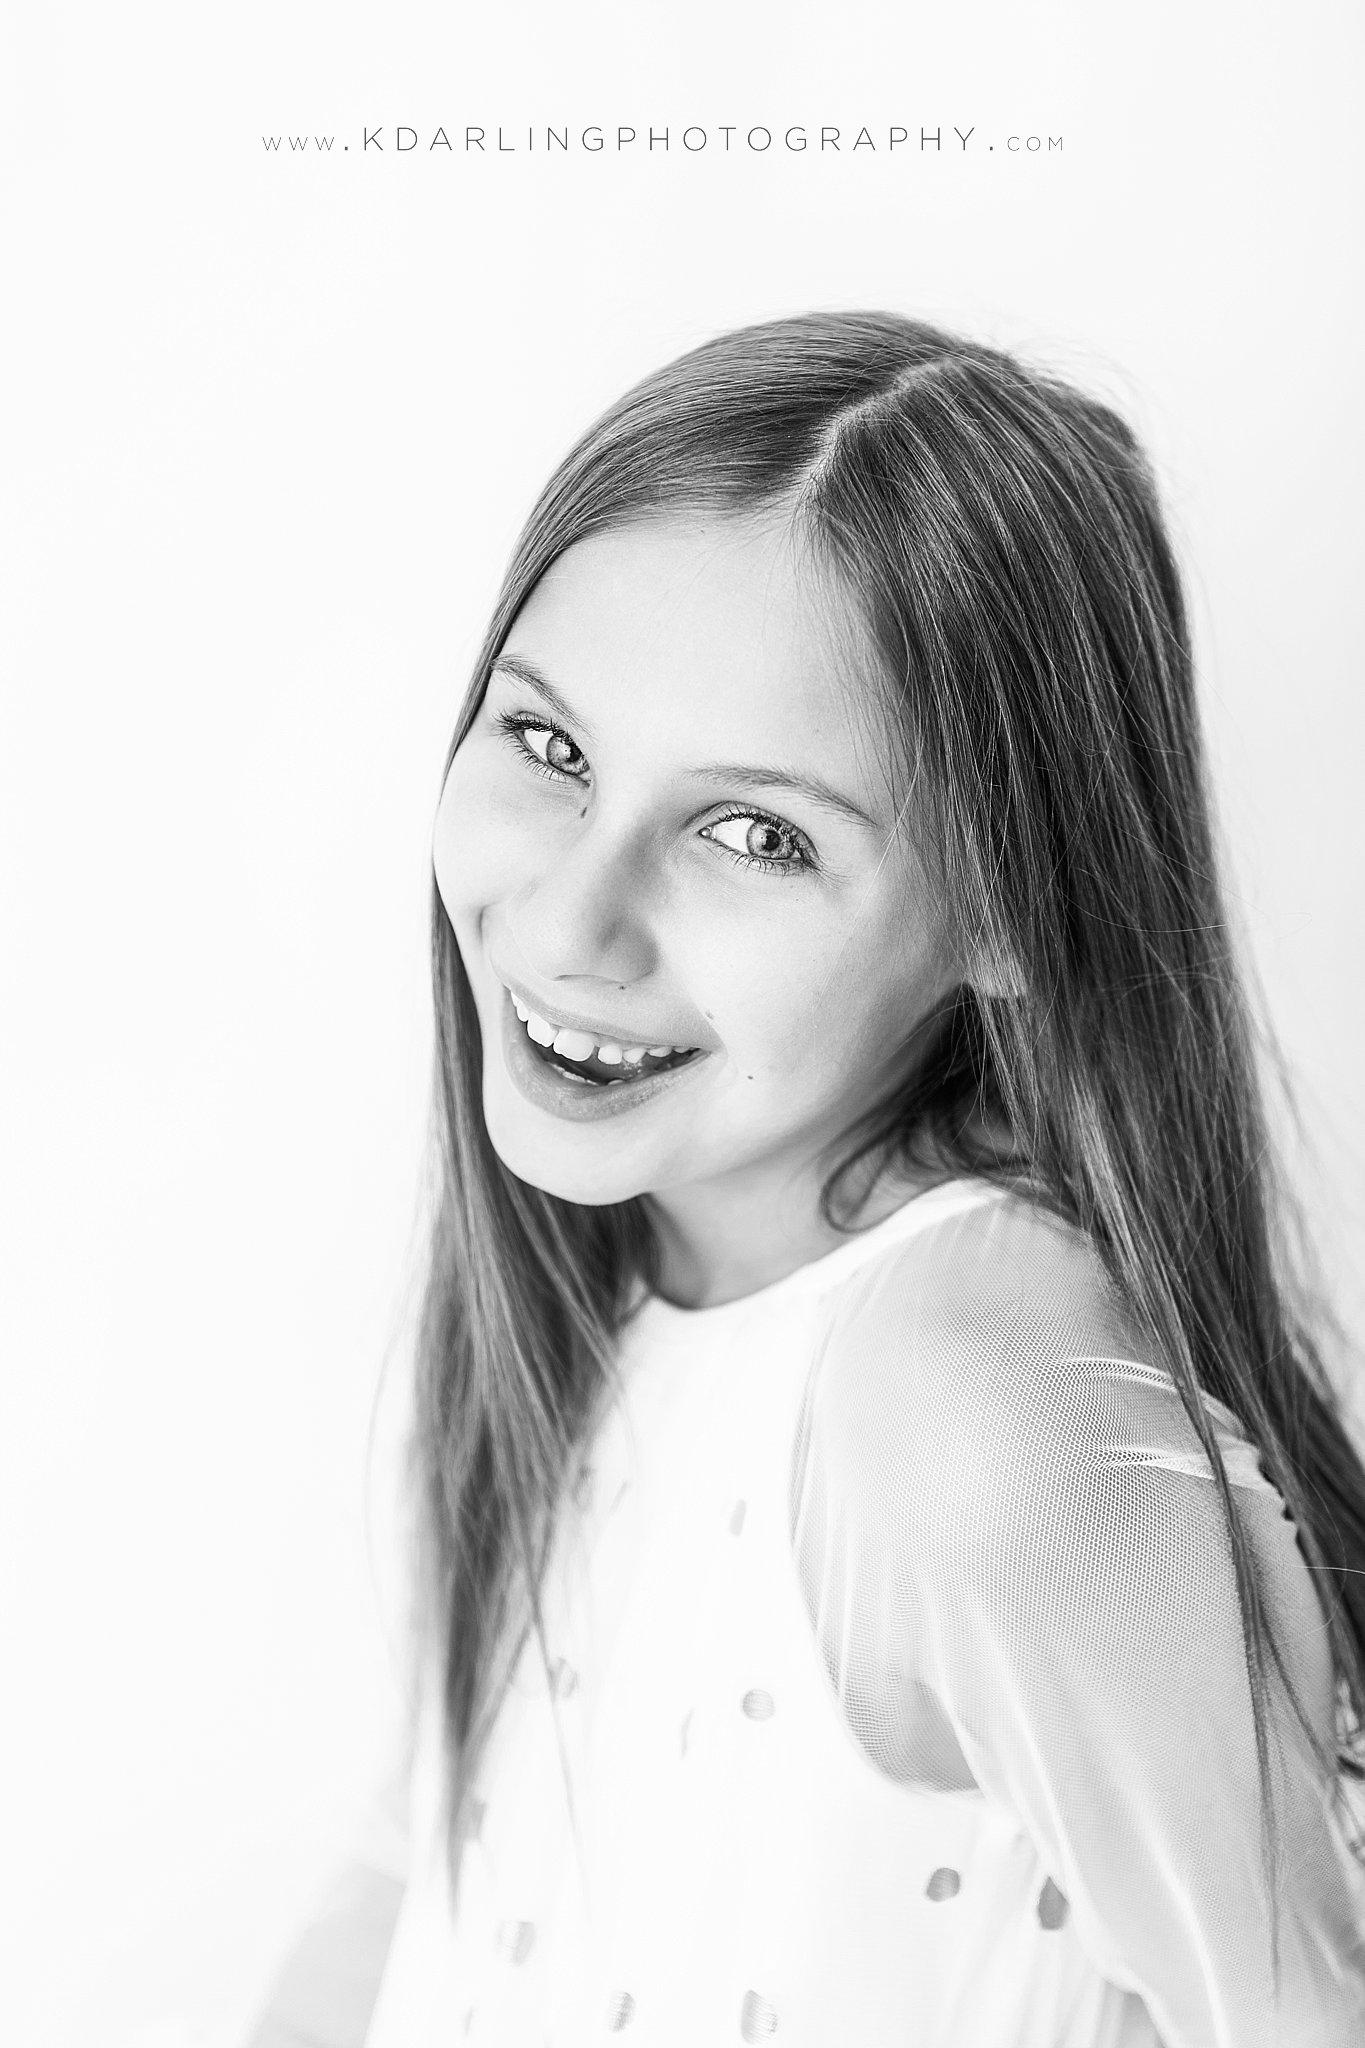 Child-Photographer-portraits-Champaign-County-IL-Fisher-Studio-Darling_0195.jpg